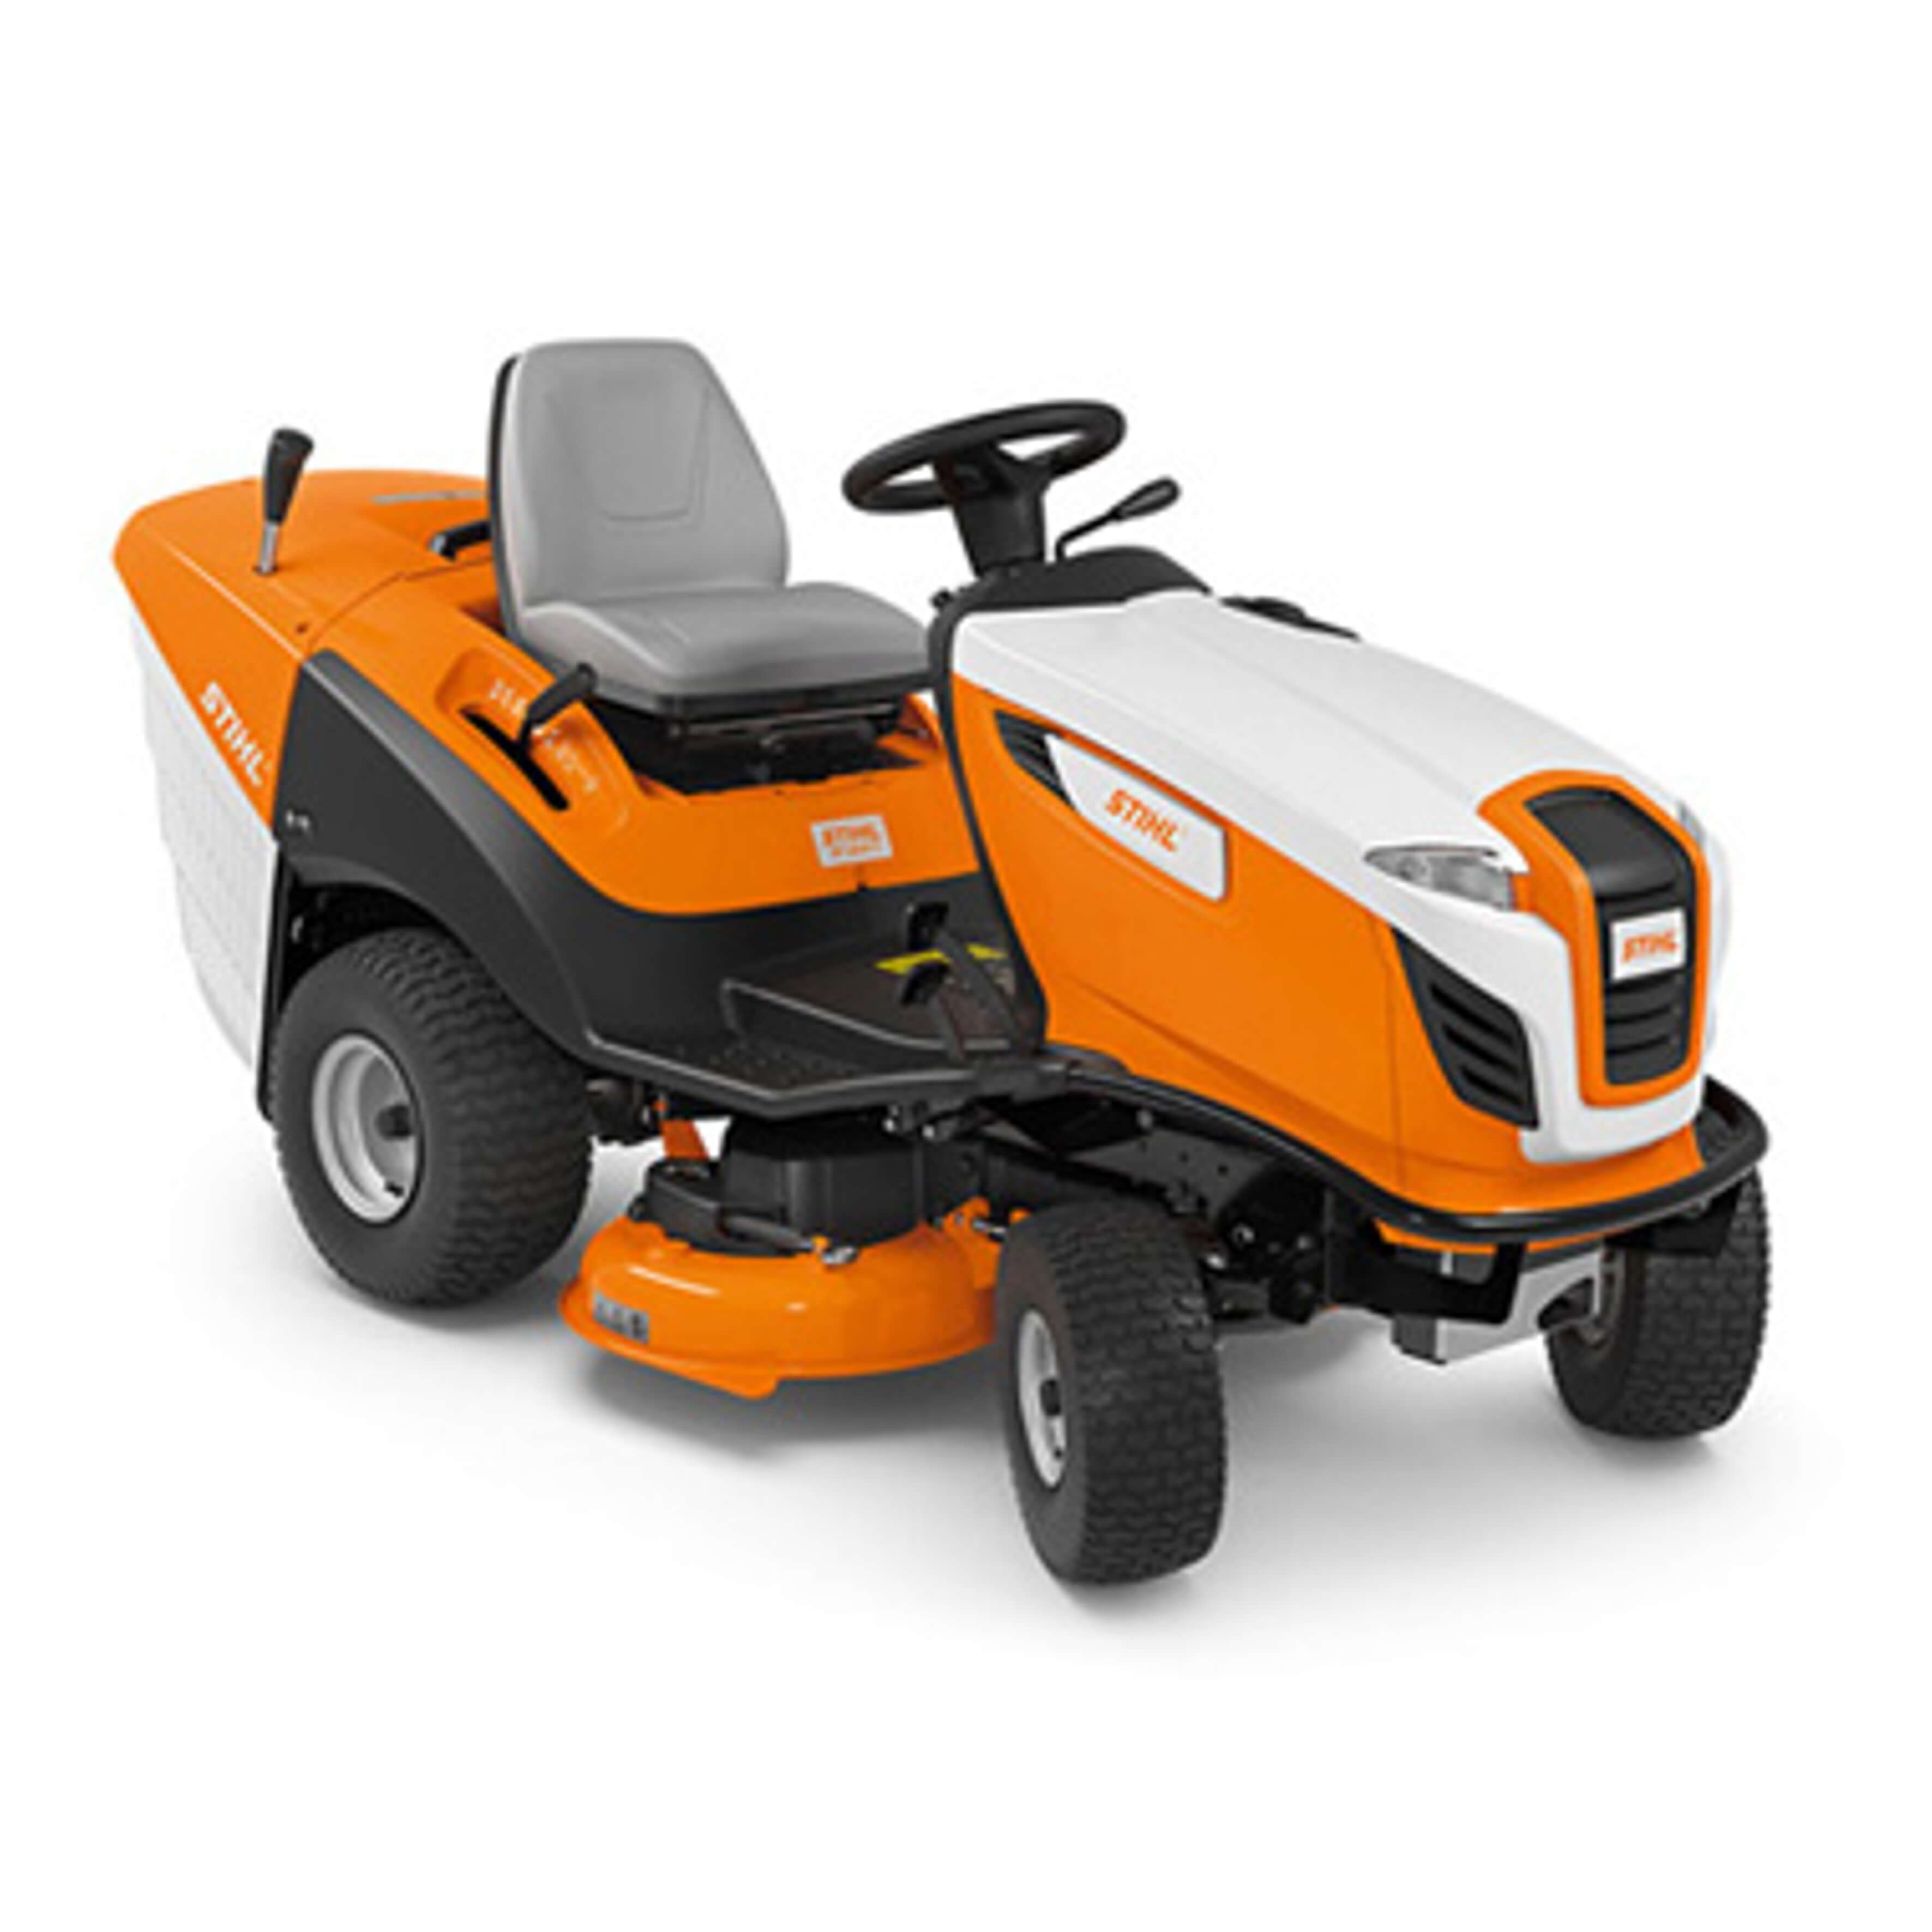 Stihl RT 5097.0 Z Ride on Mower Parts